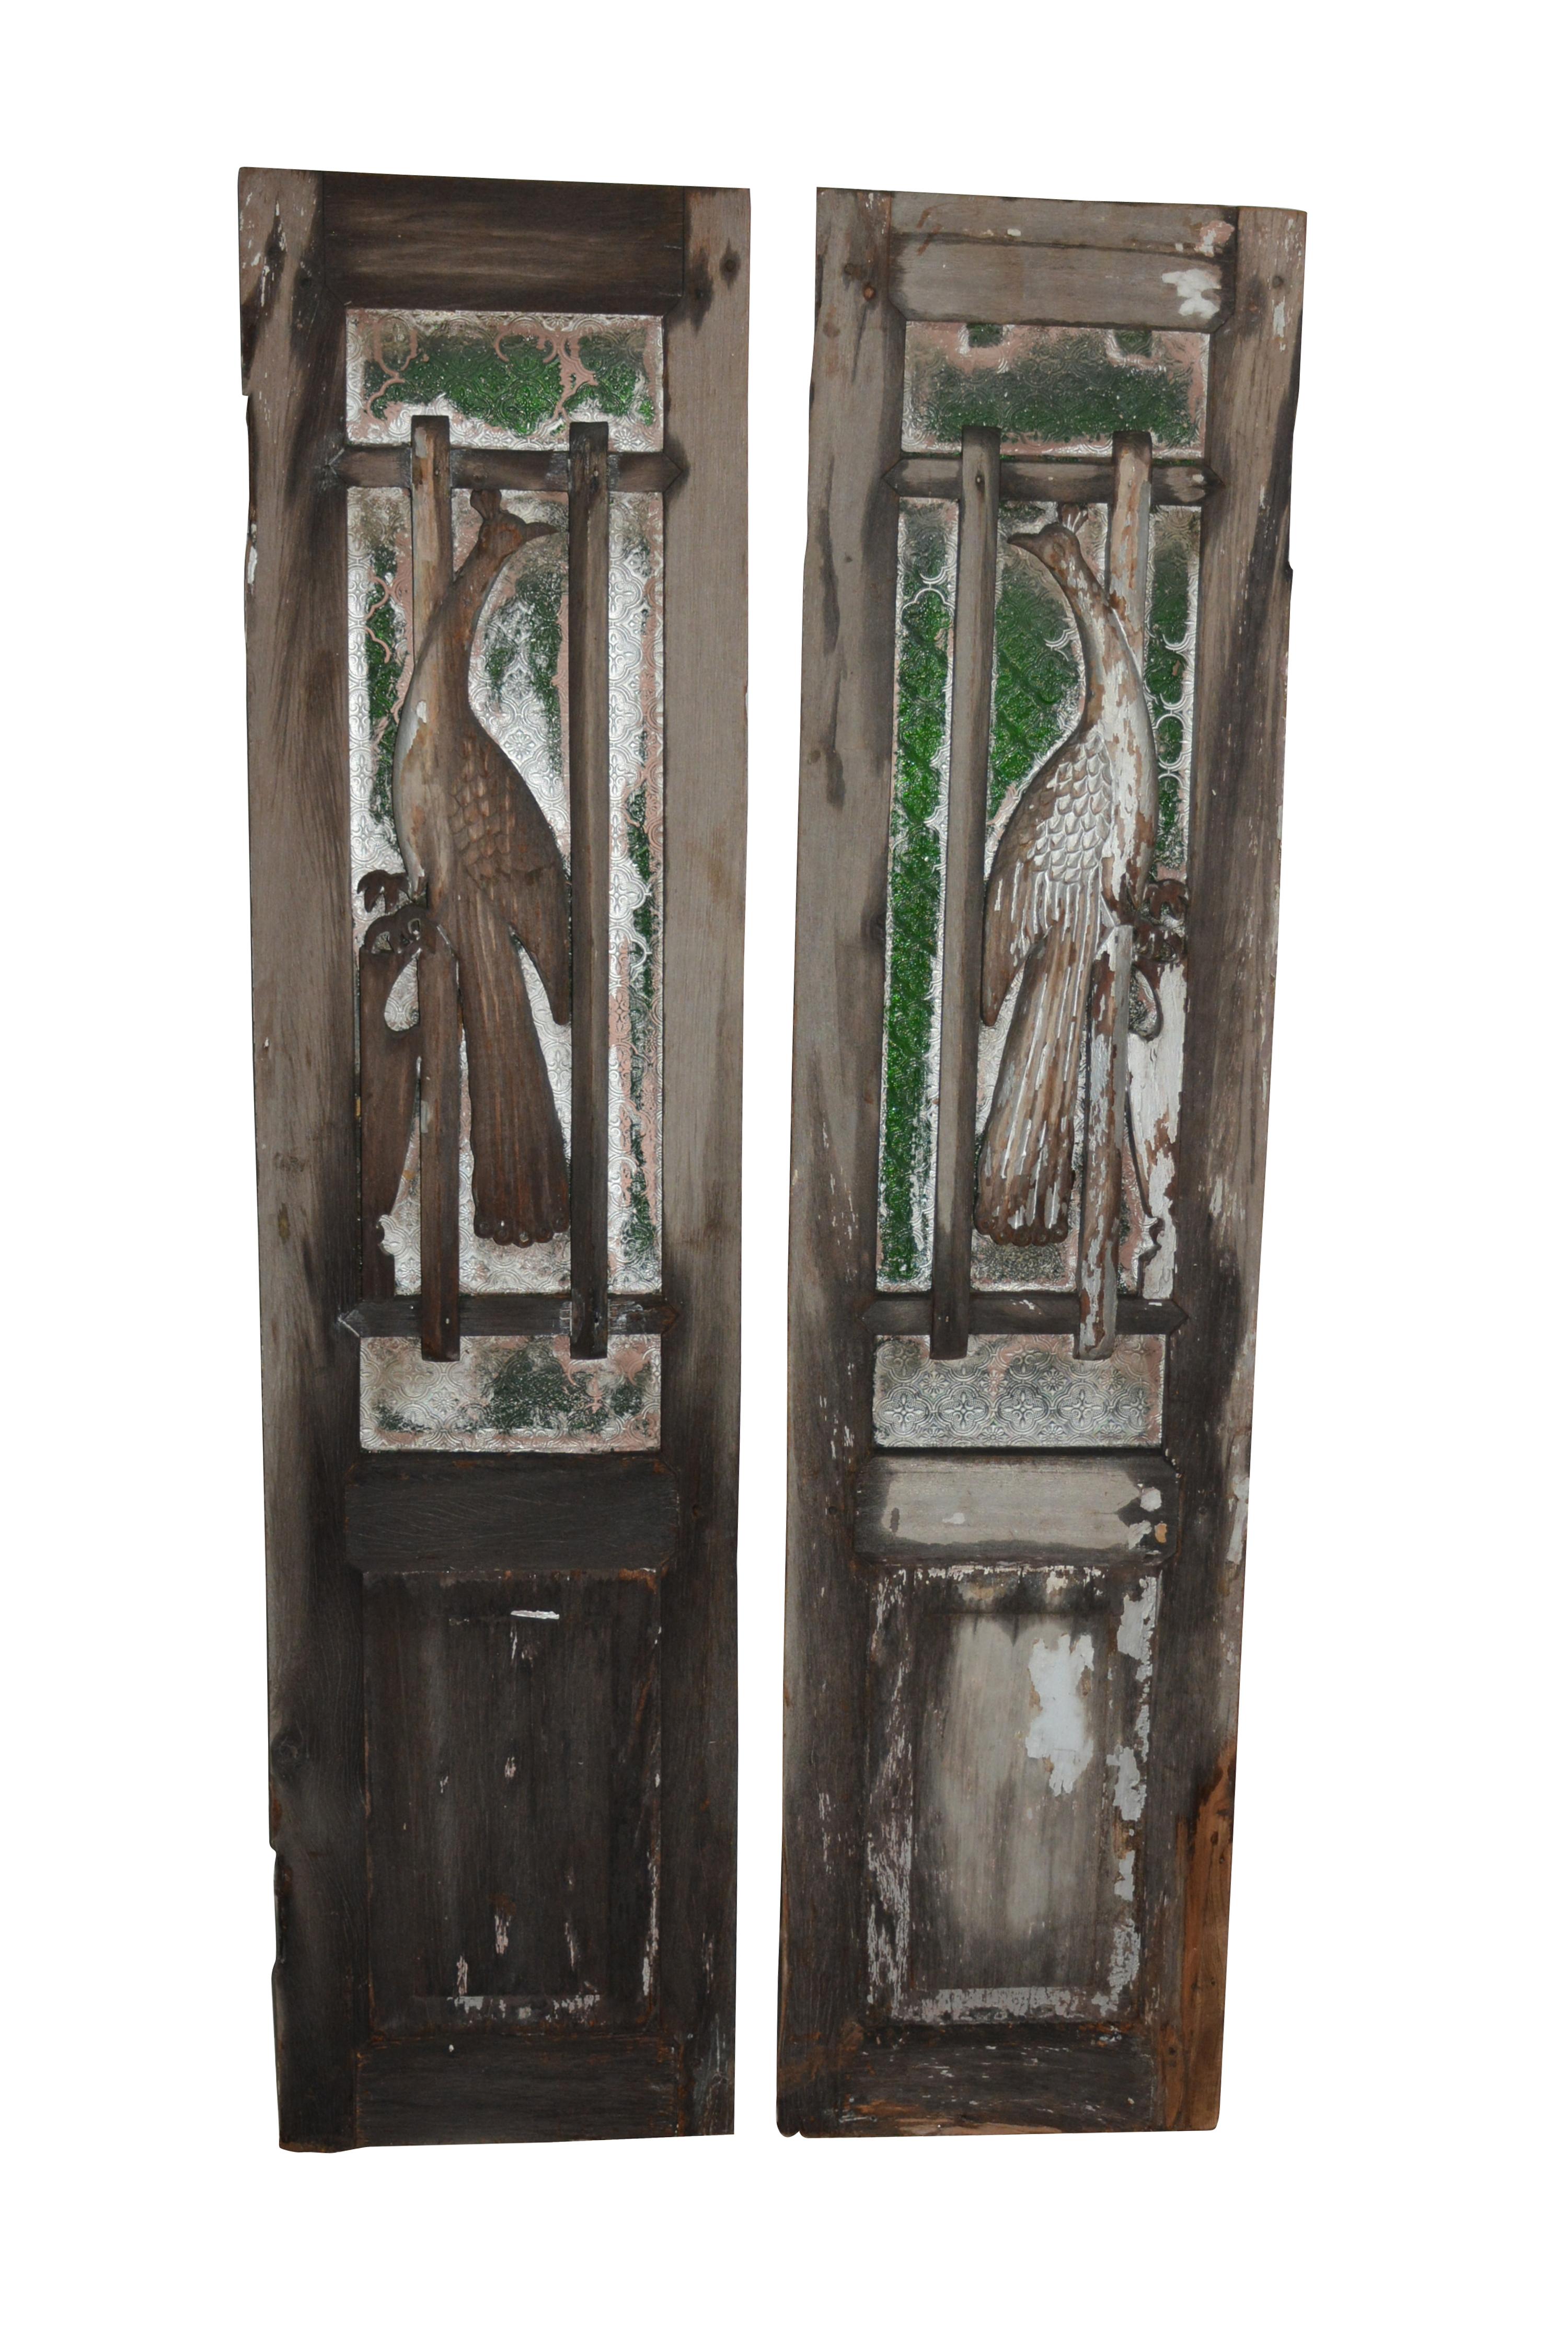 ANRA14115 - 28 x 4 x 120cm each